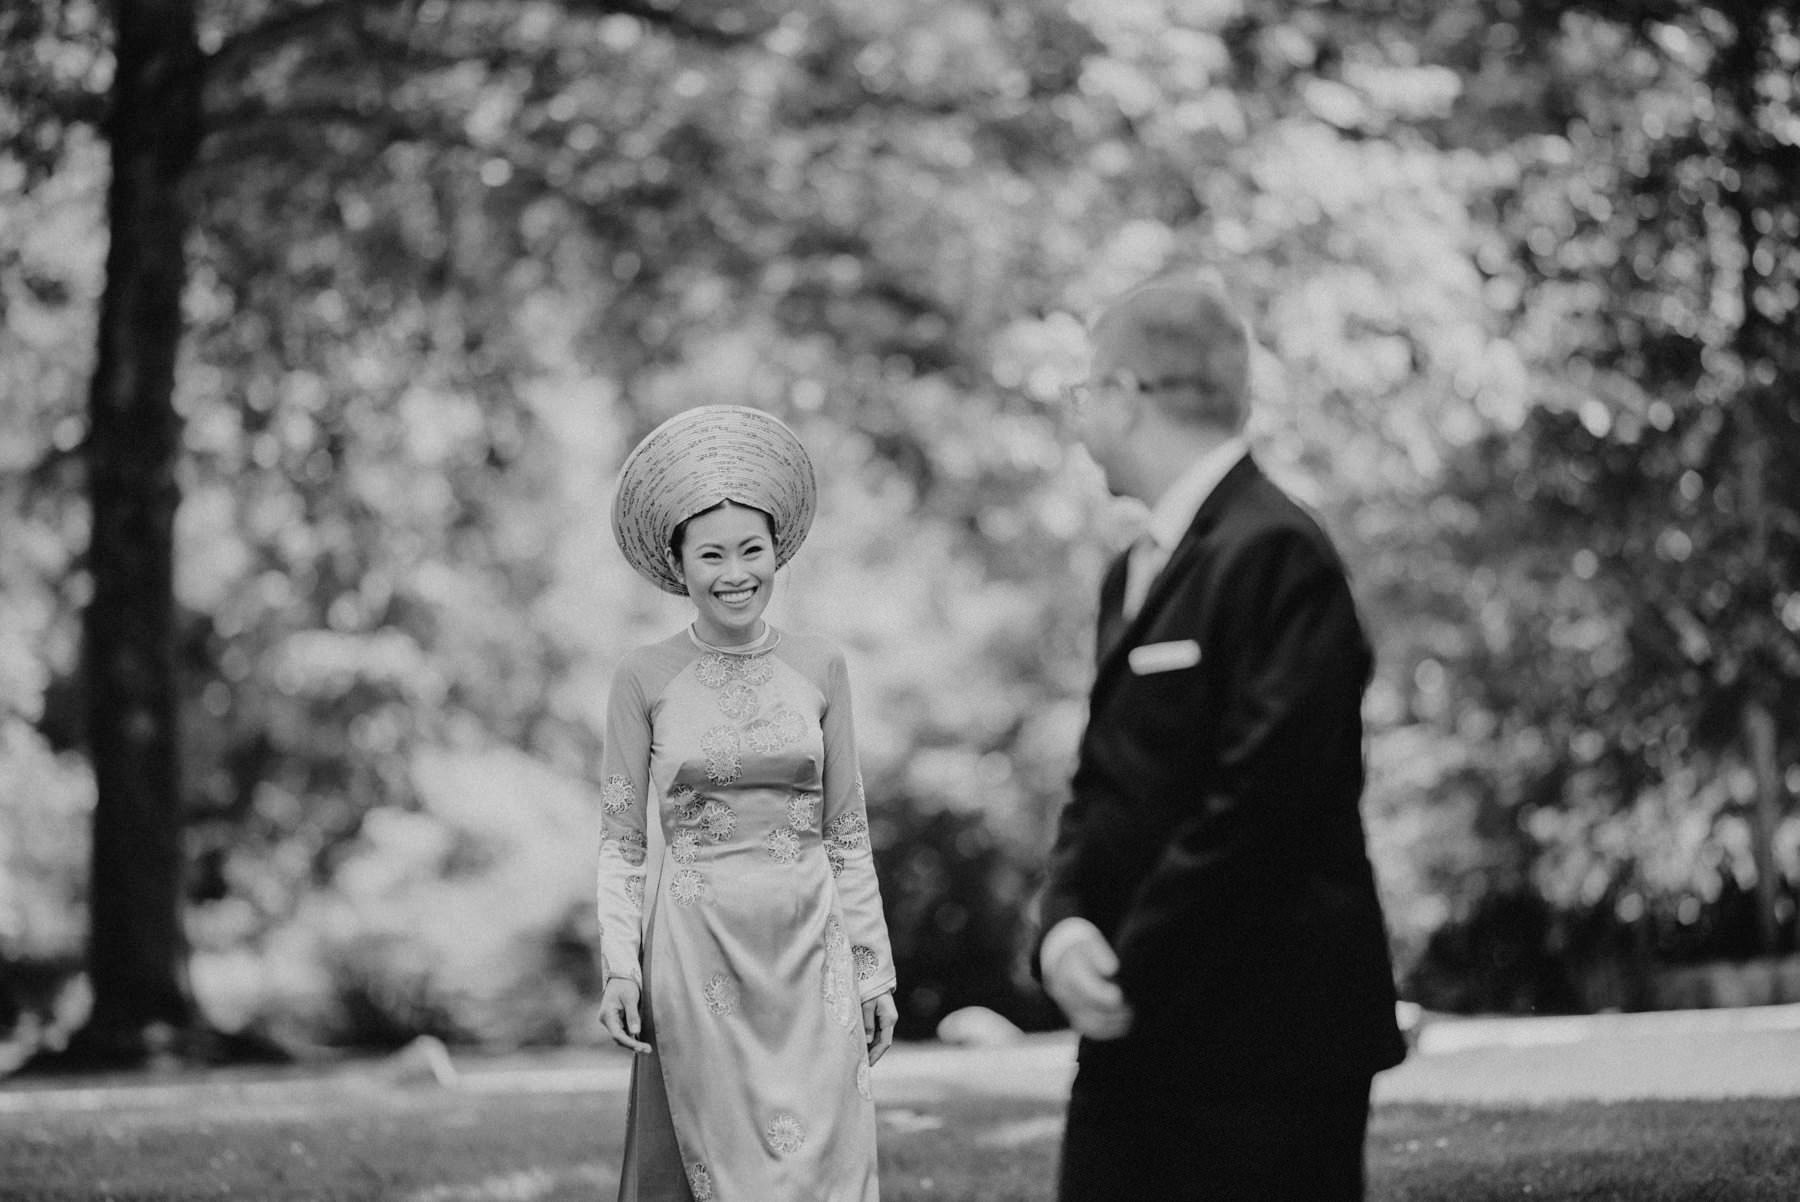 Appleford-estate-wedding-22.jpg